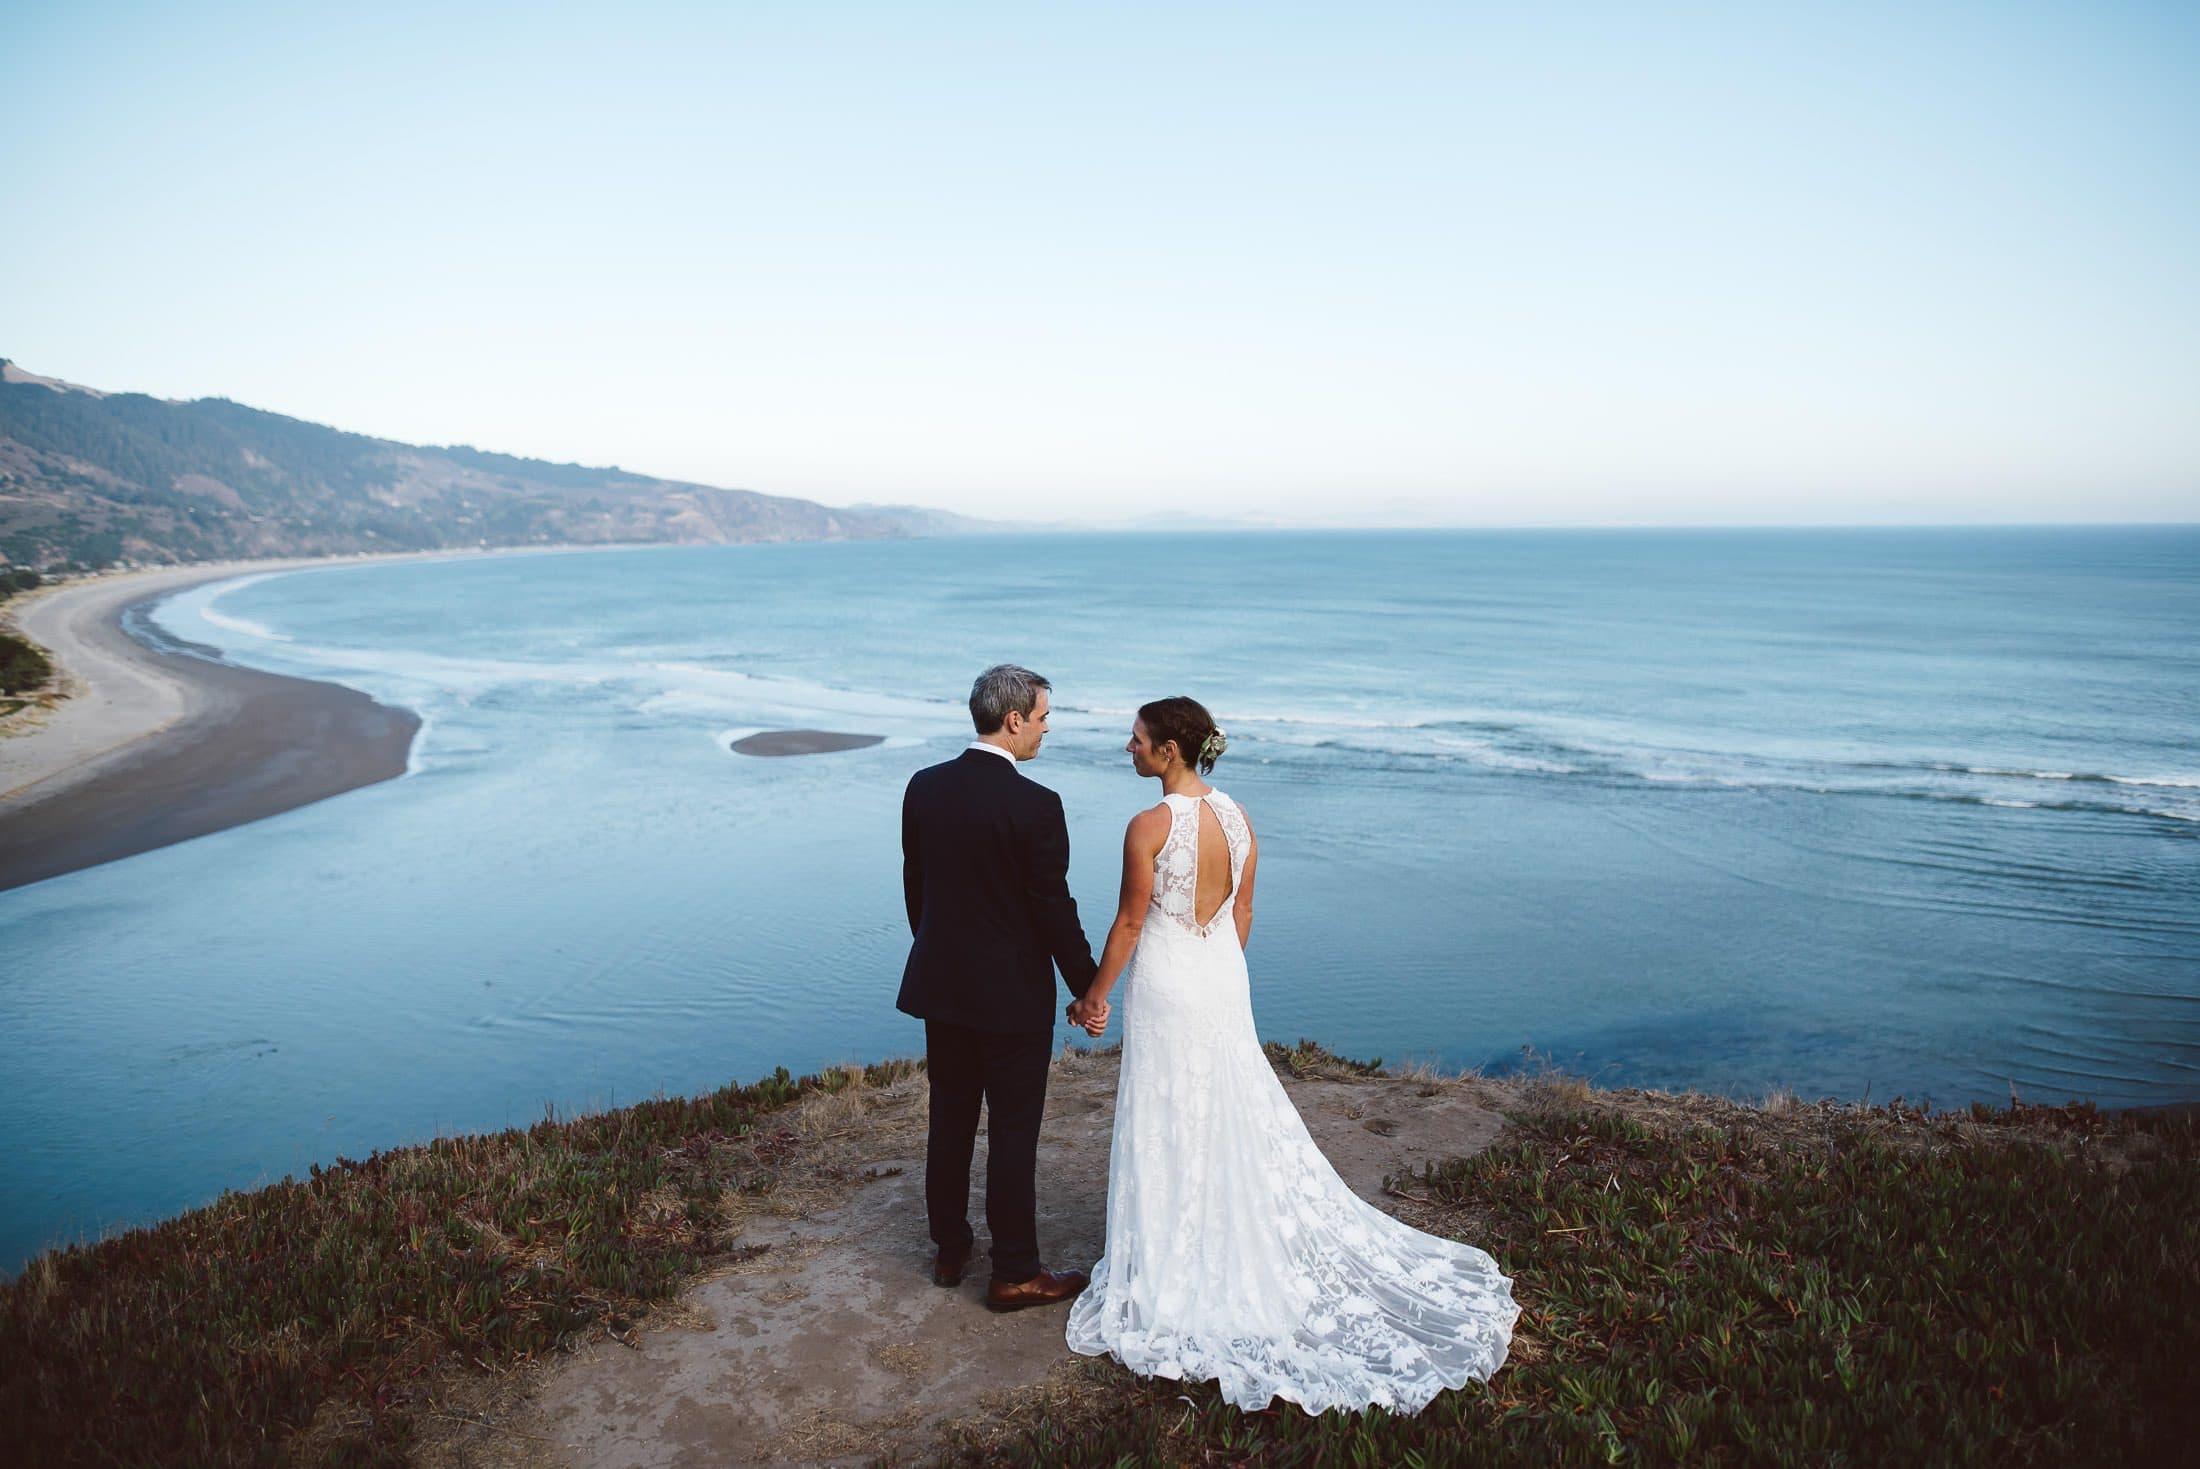 Bolinas wedding portrait overlooking the ocean